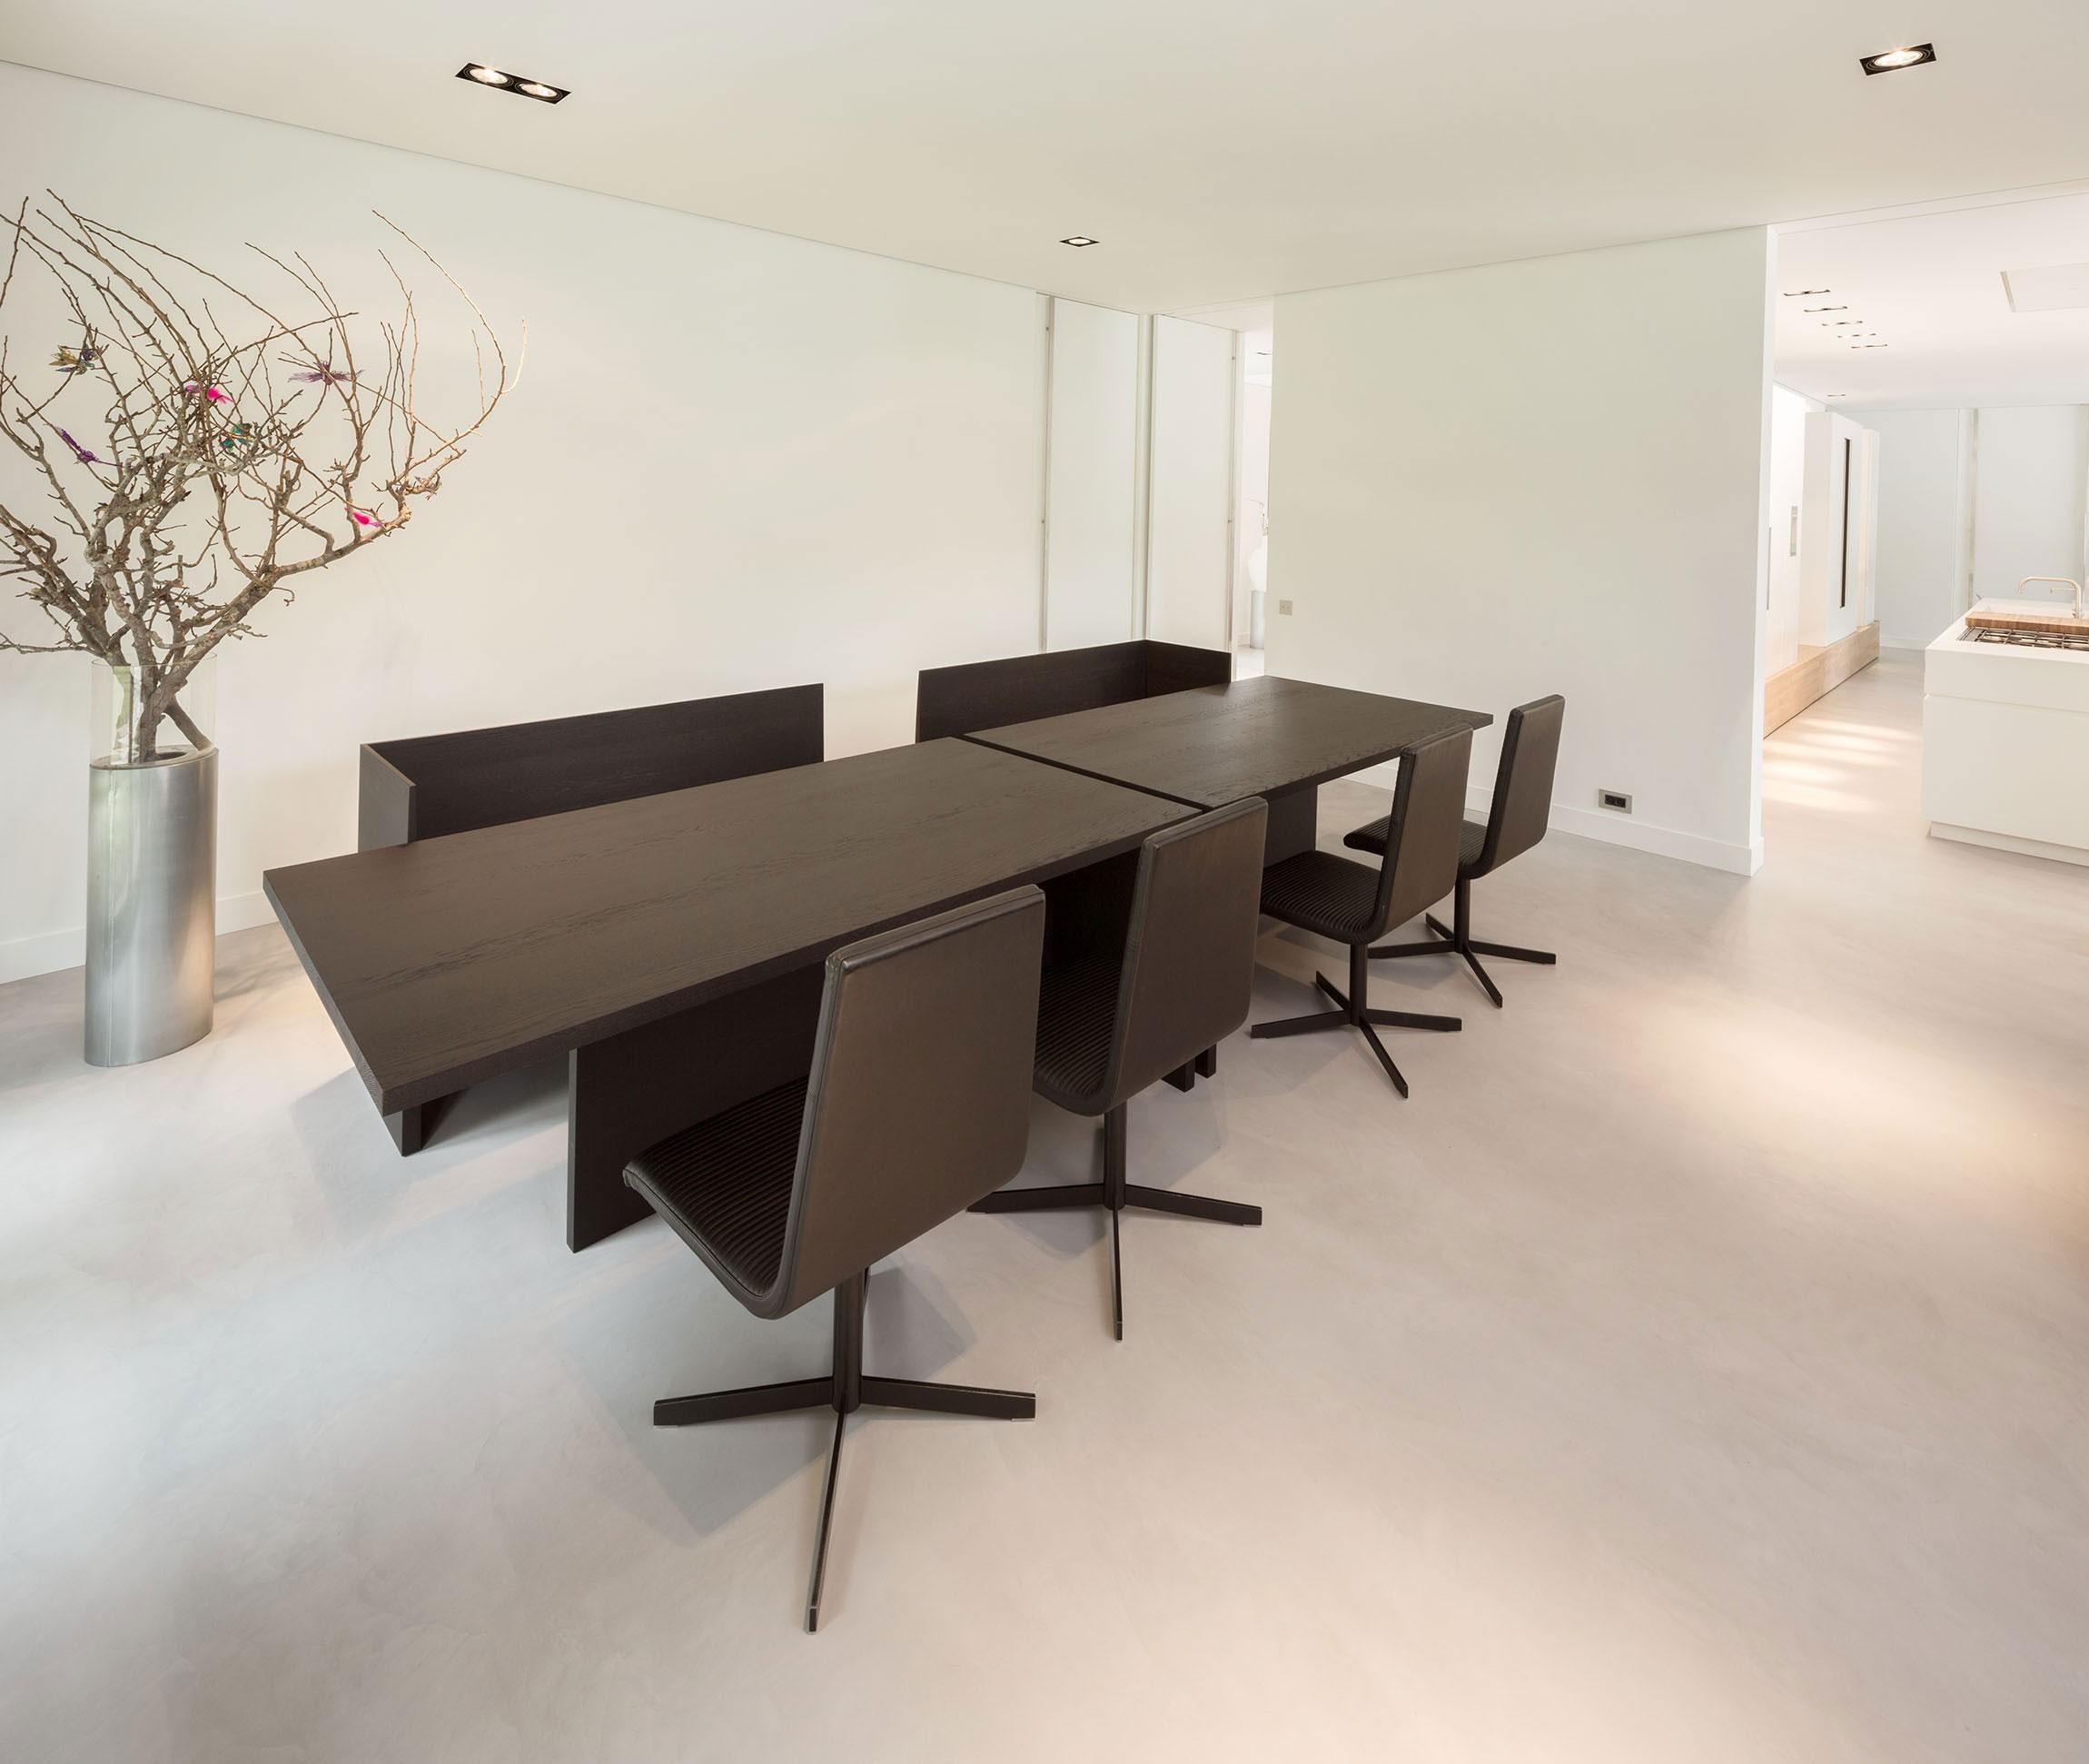 Modern Huizen Country House Located in a Quiet Rural Setting by De Brouwer Binnenwerk-12